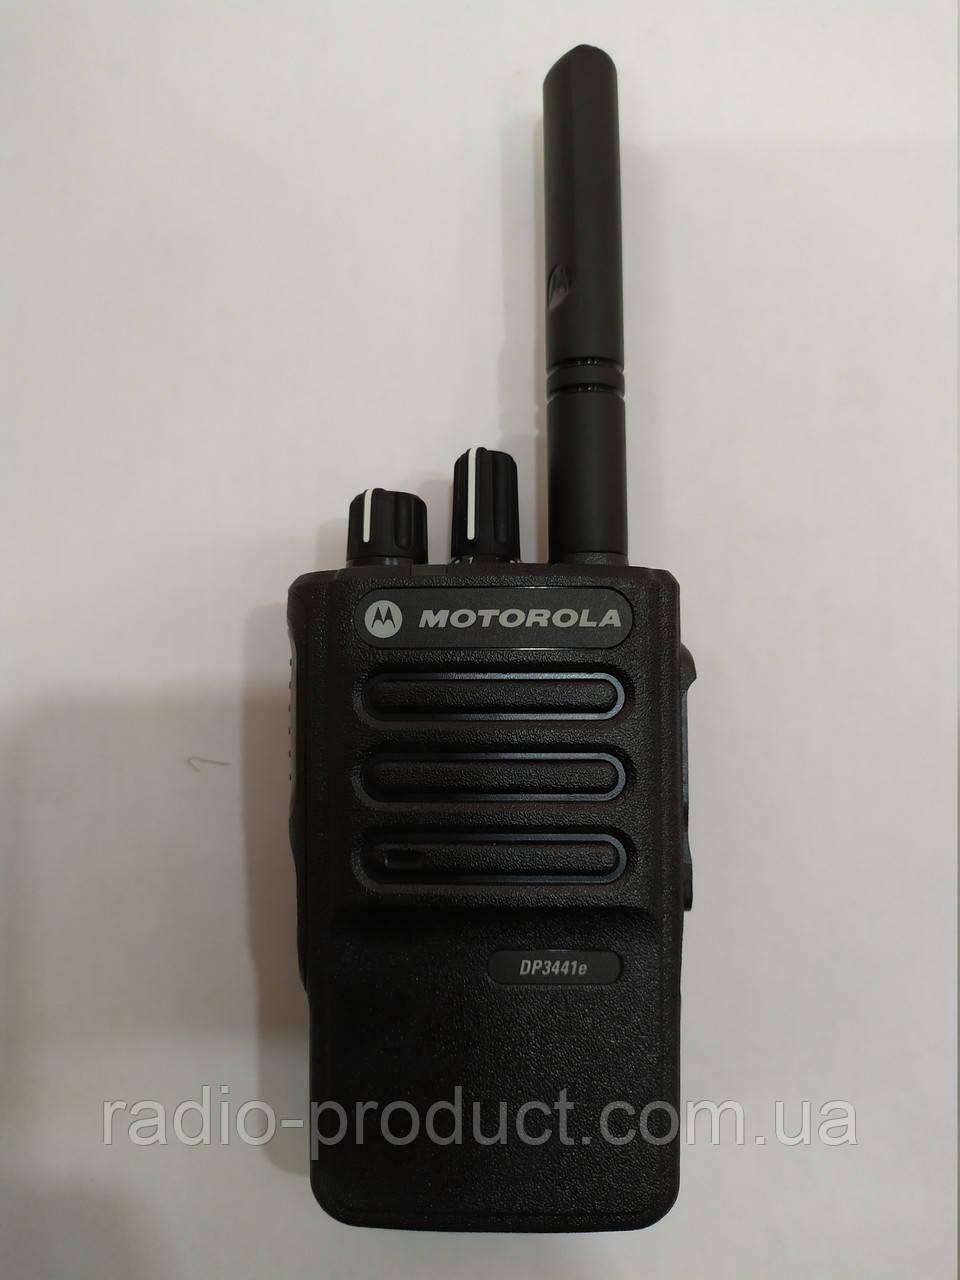 Motorola DP3441E, аналогово-цифровая (DMR) радиостанция VHF диапазона